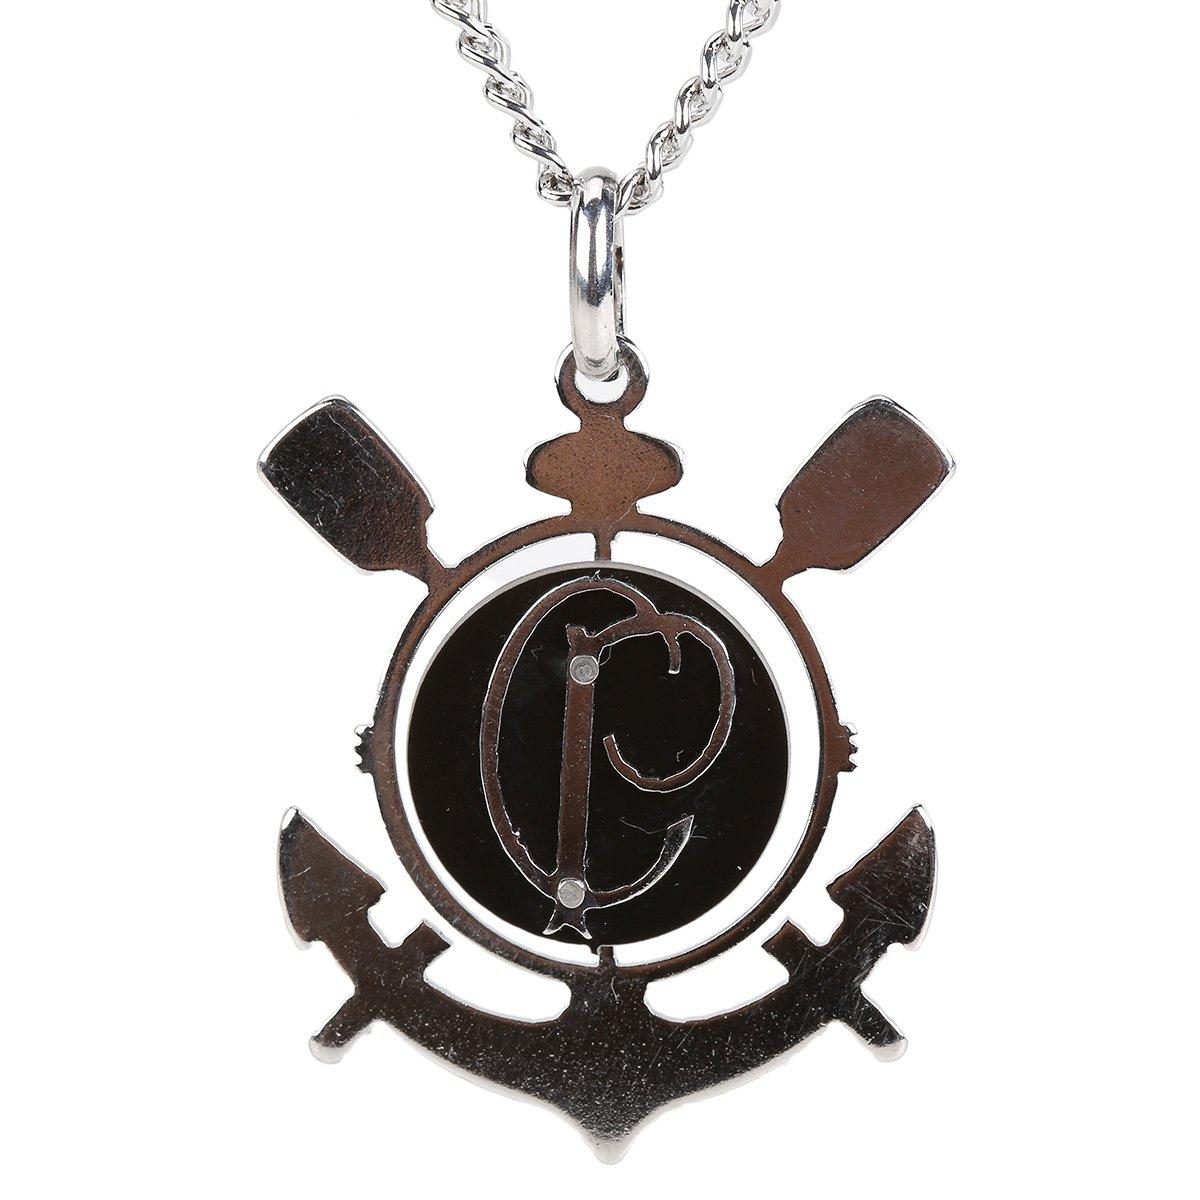 Corrente Corinthians c  Pingente Símbolo e CP Masculina - Compre Agora  20fef15a45029